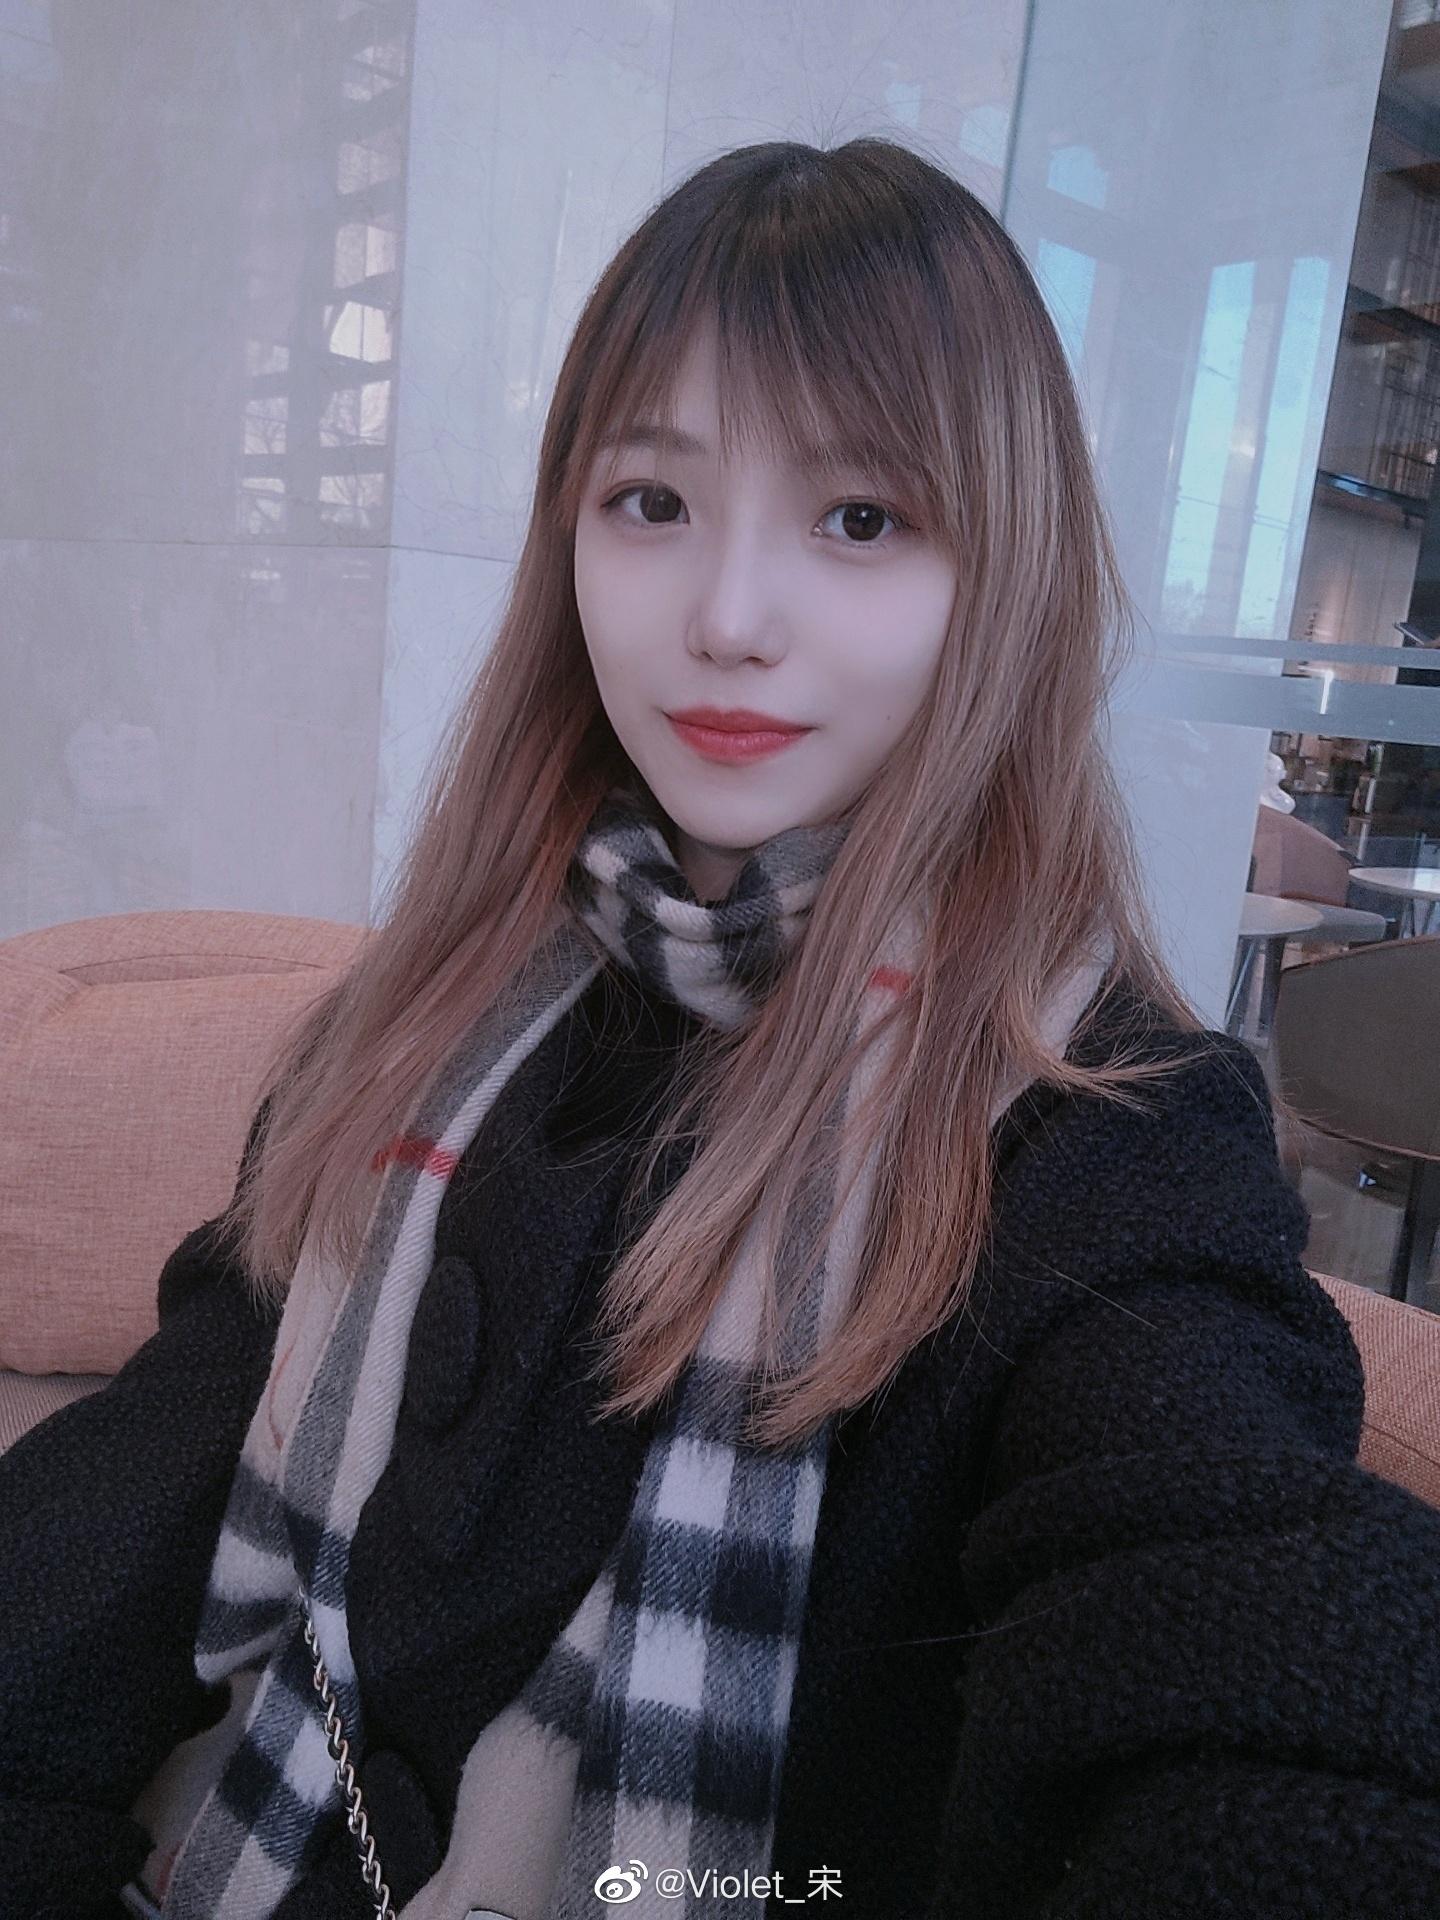 宋紫薇_202101121557_005